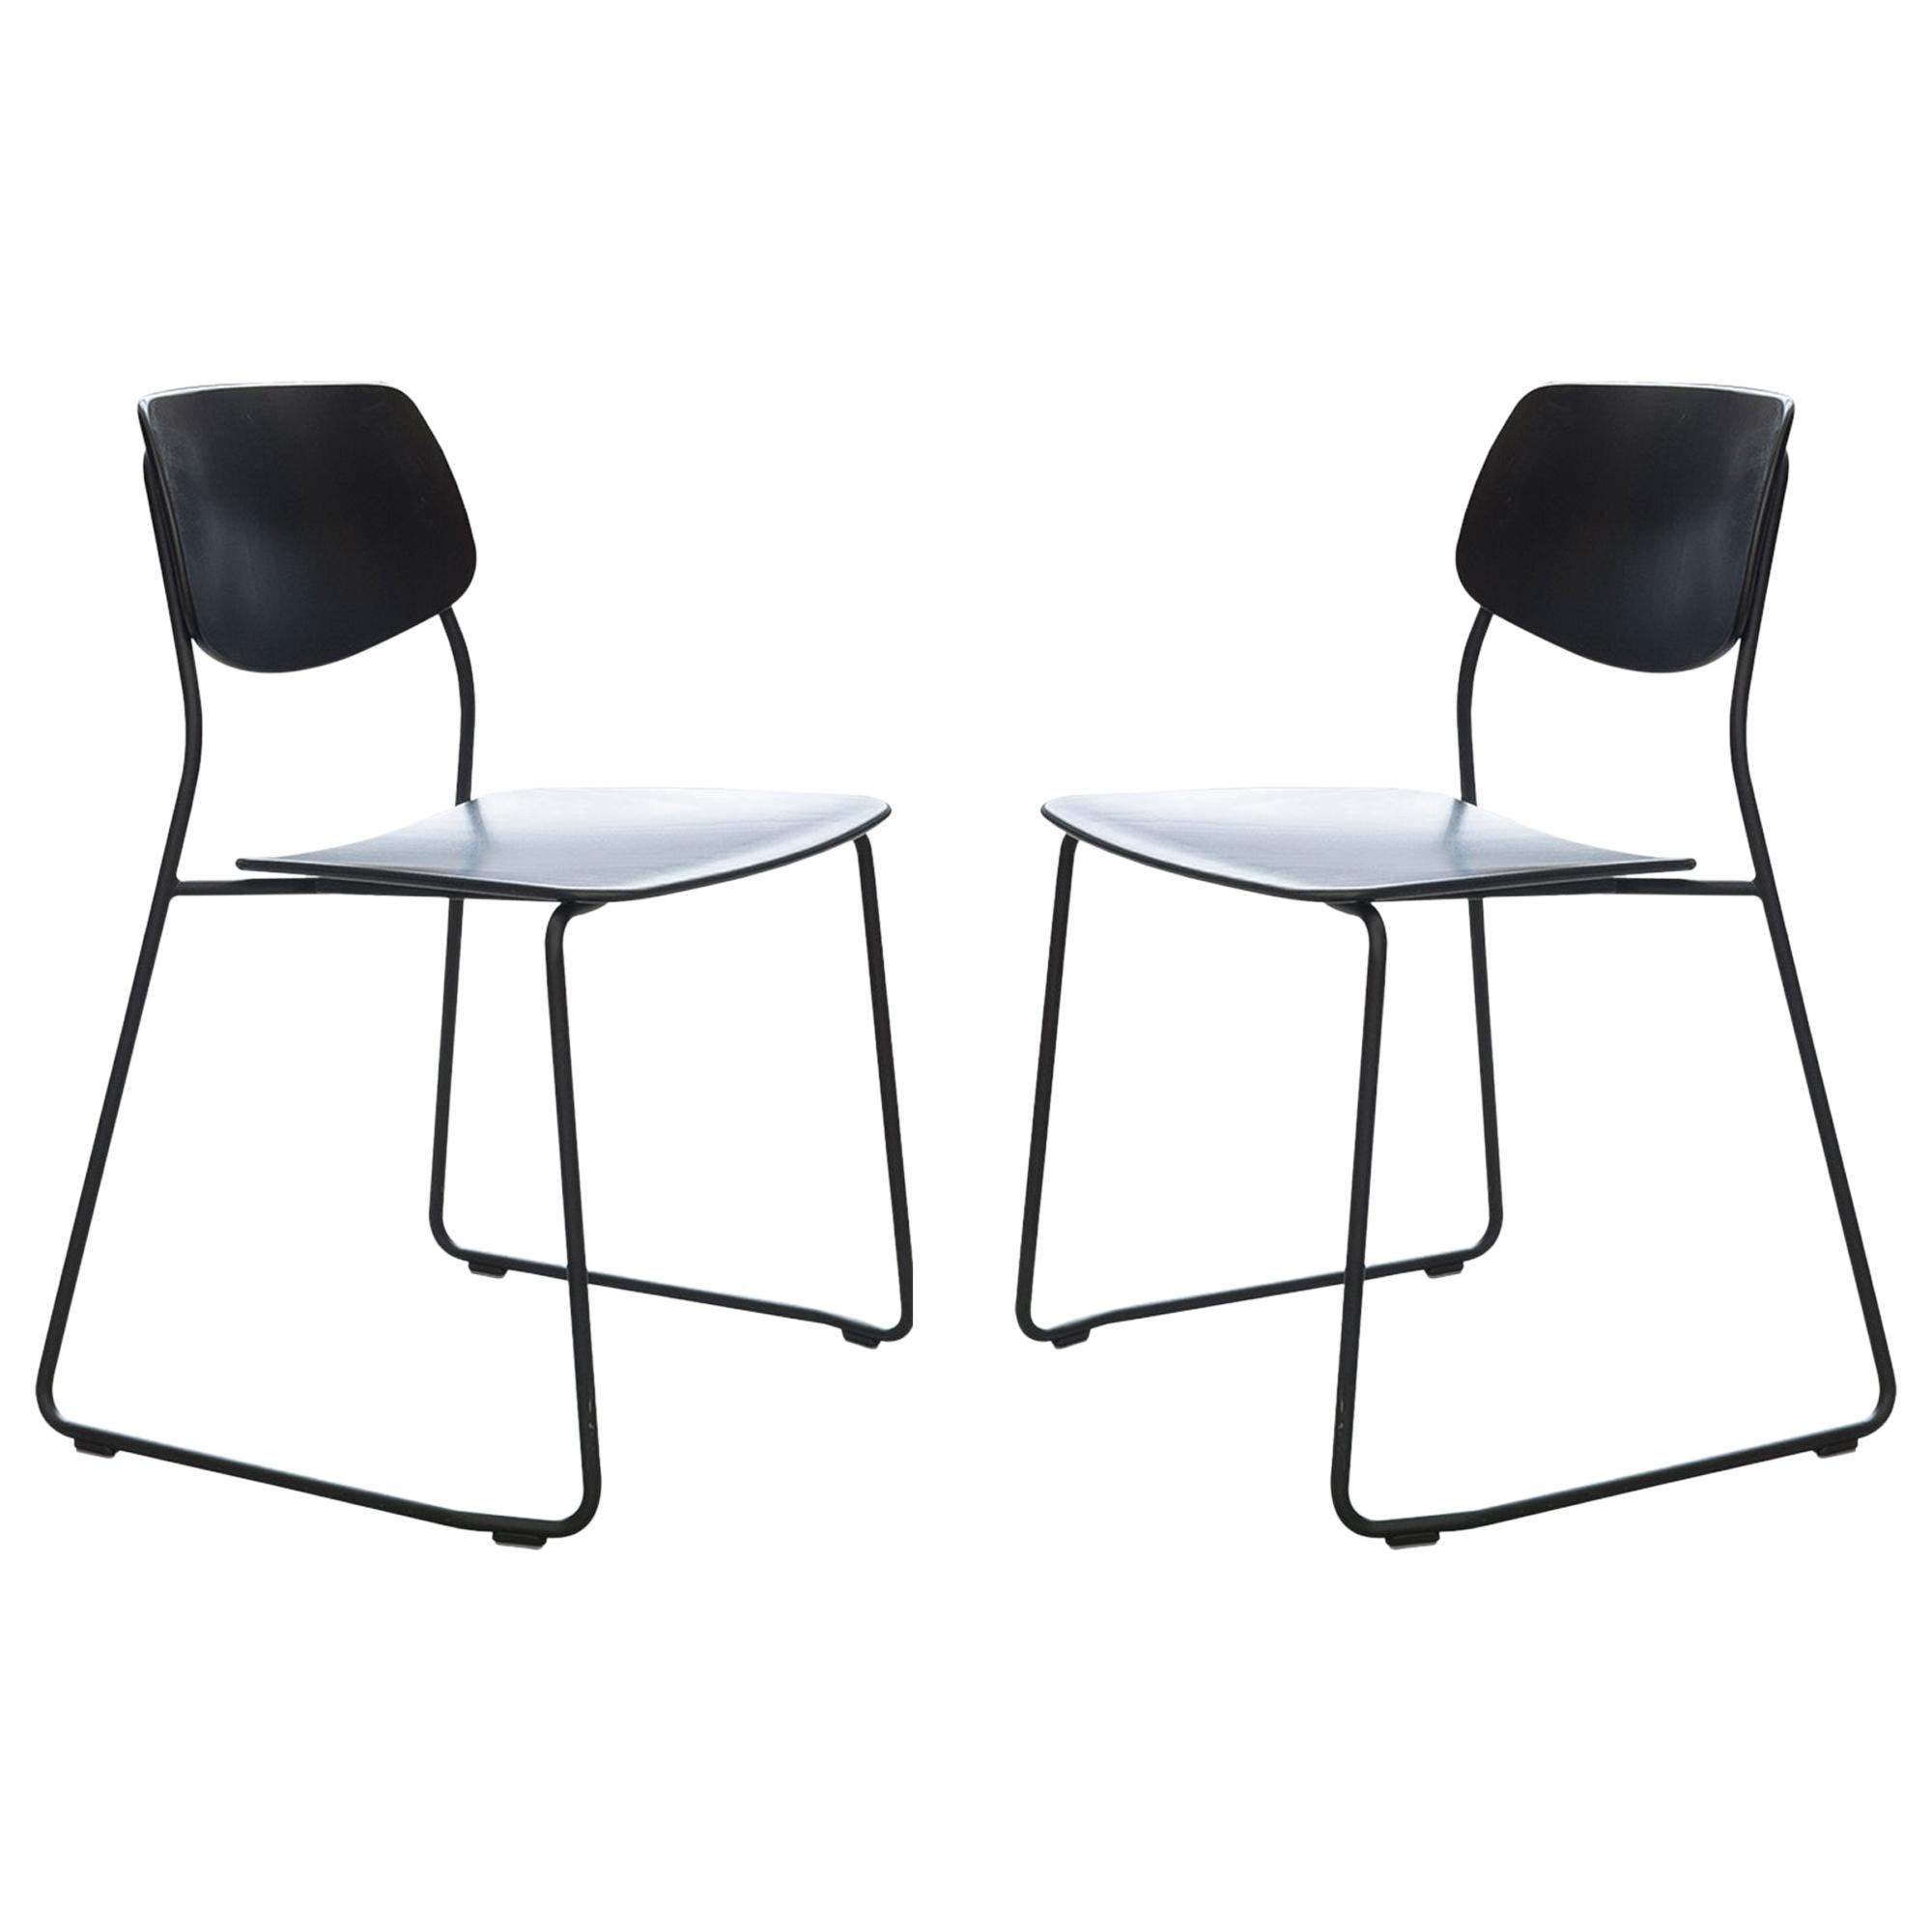 Dietiker Felber C14 Sled Modern Dining Chair, Modular Design, Set of 2